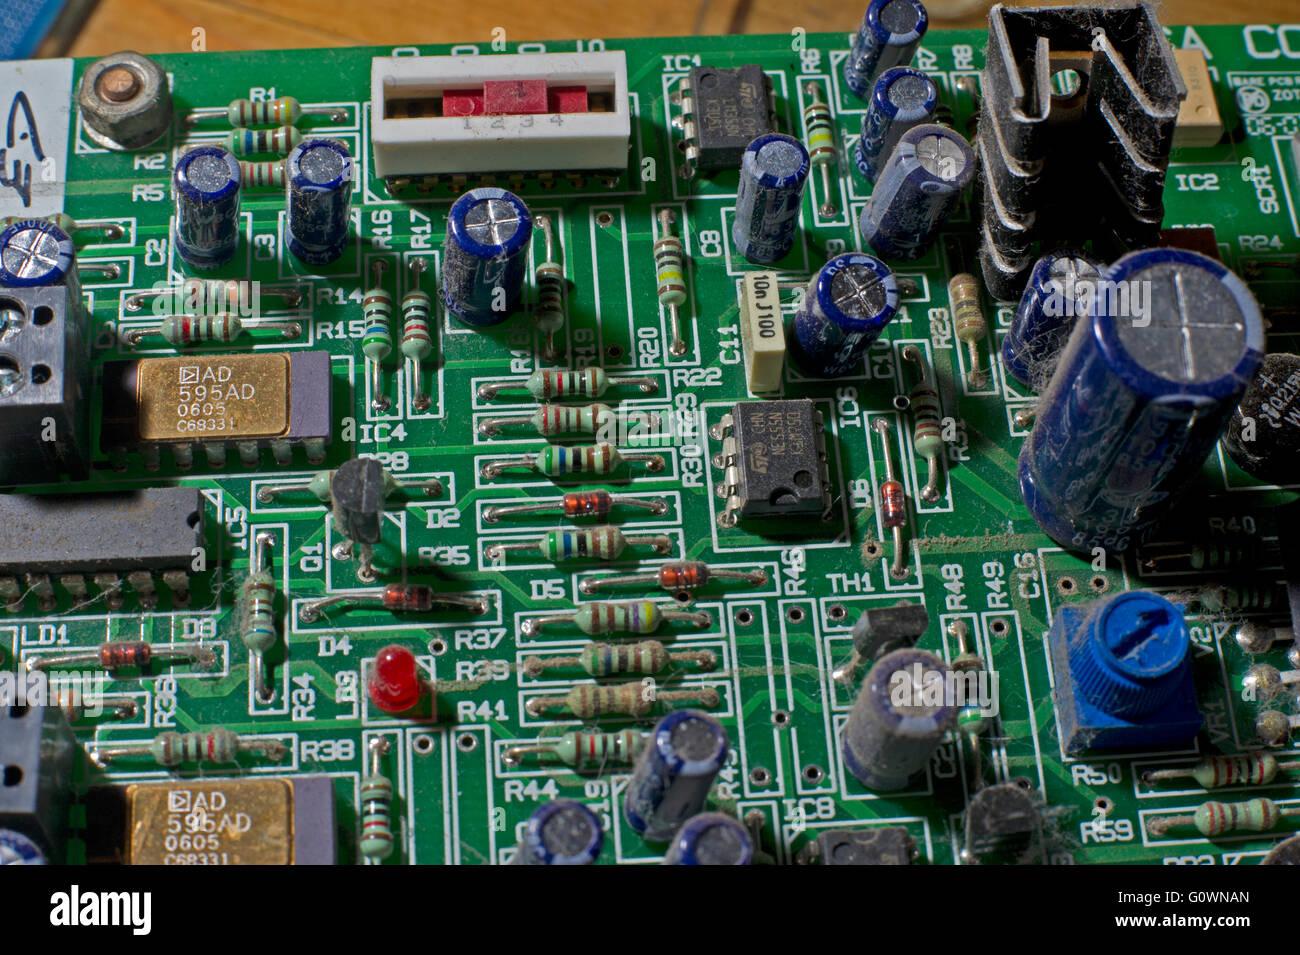 Electric Circuit Board Stock Photos Cooker A Close Up Of An Aga Image